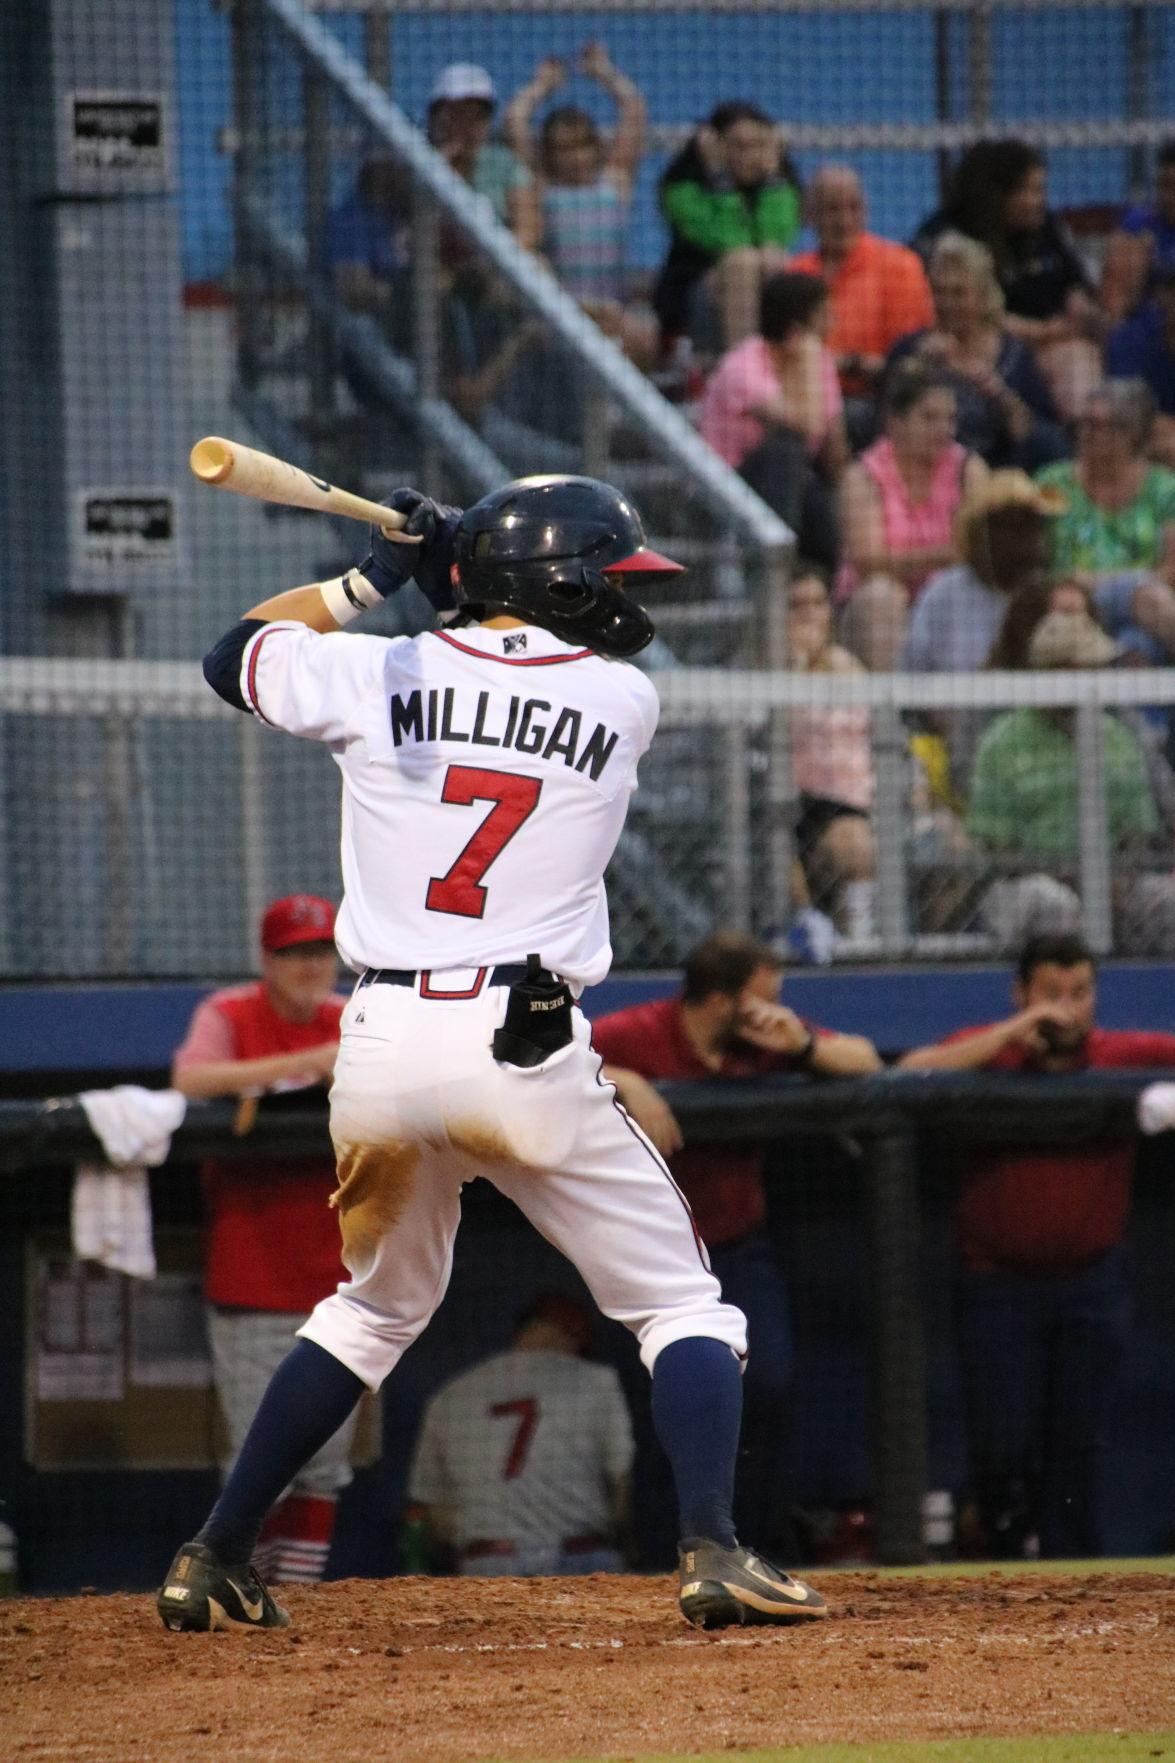 Milligan.JPG